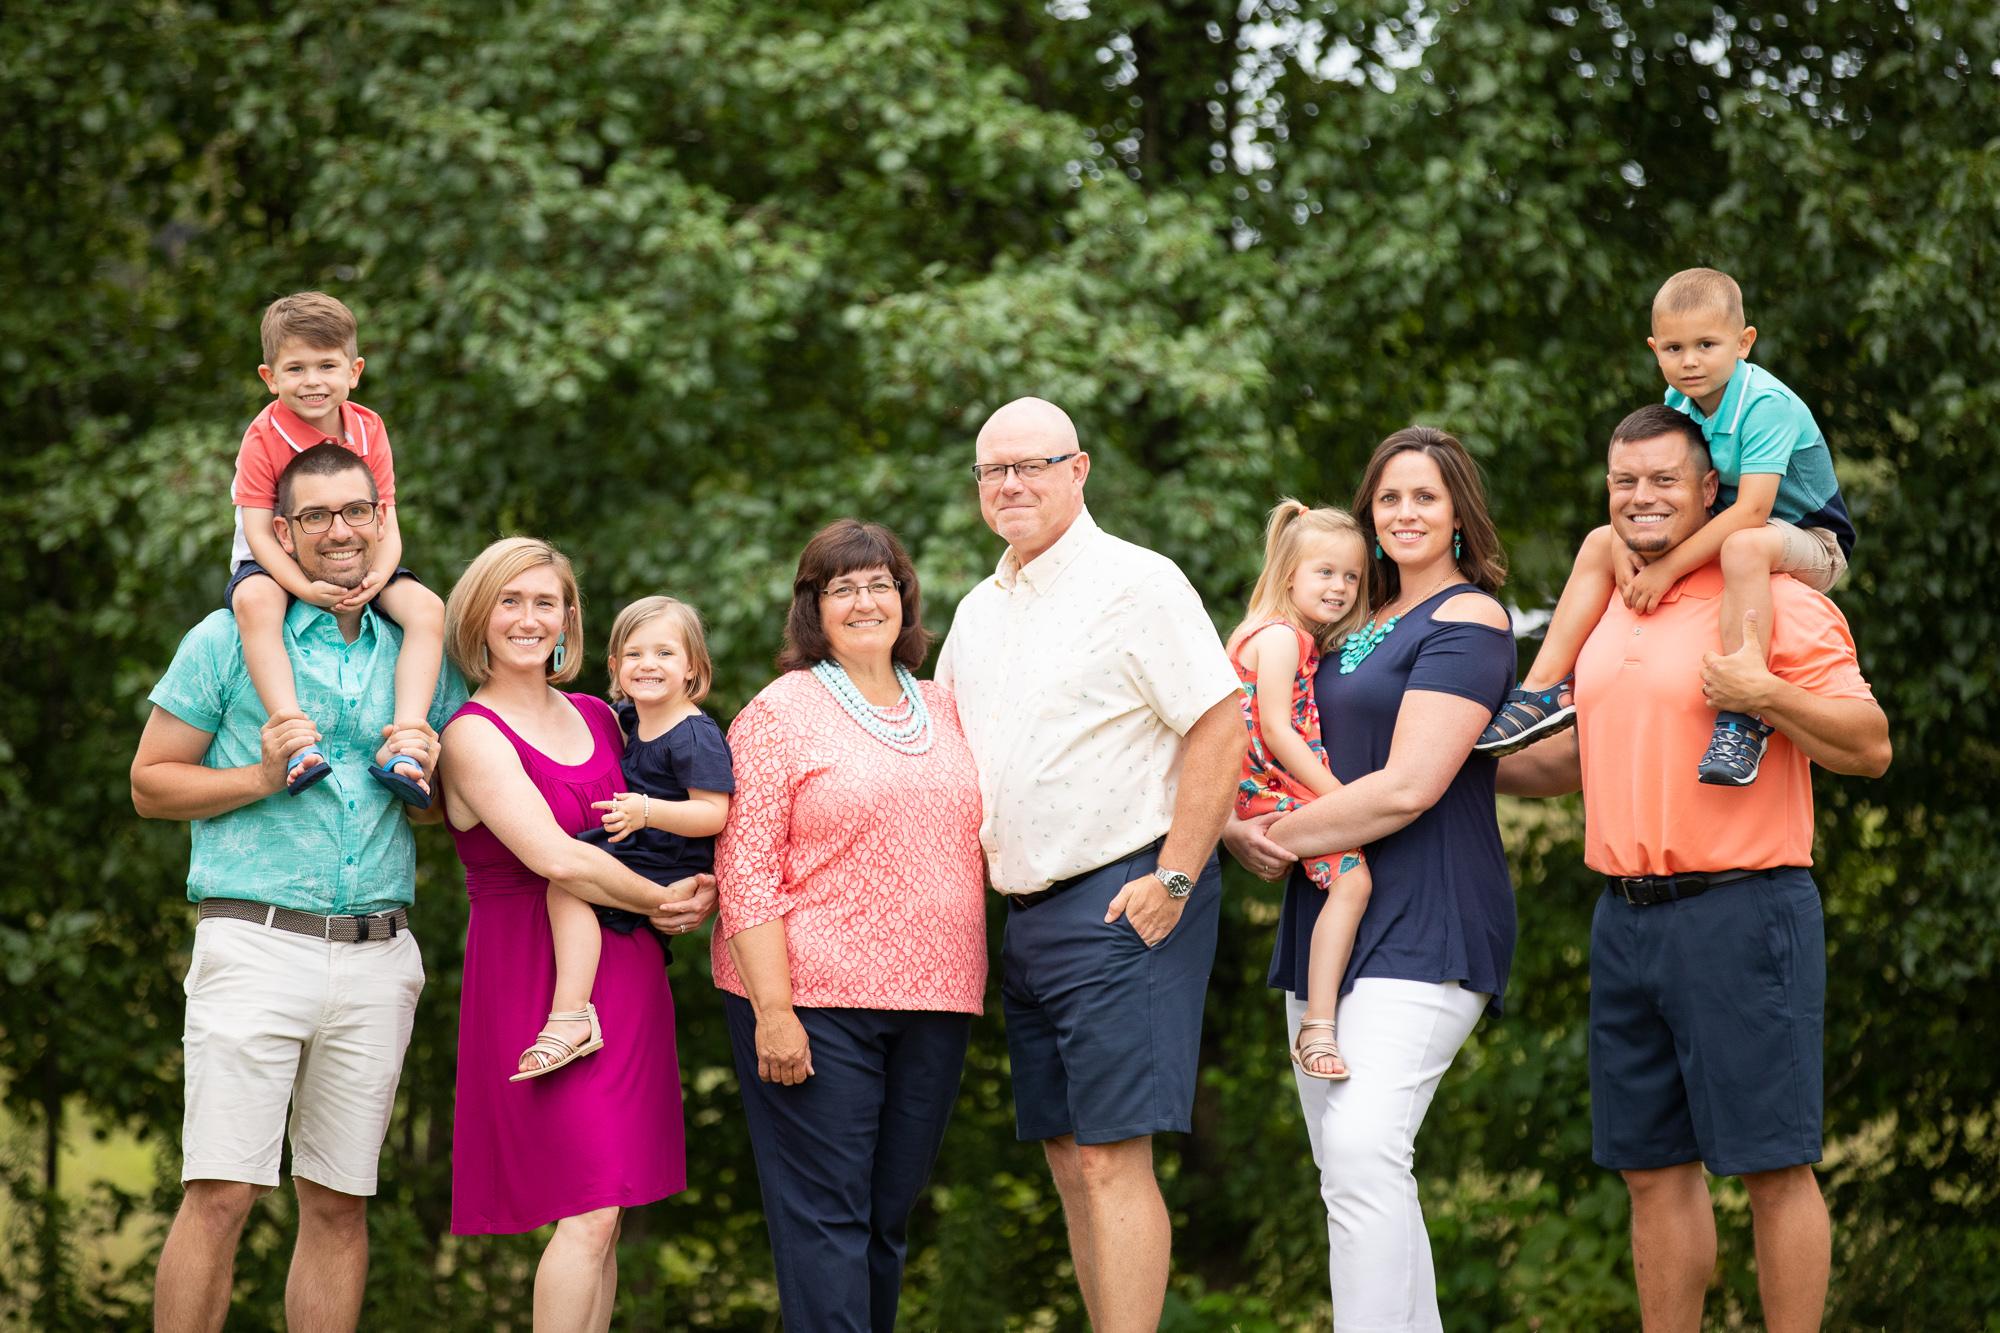 pittsburgh family photographer, family photos pittsburgh pa, pittsburgh photographers, pittsburgh family photos, taylor elizabeth photography pittsburgh